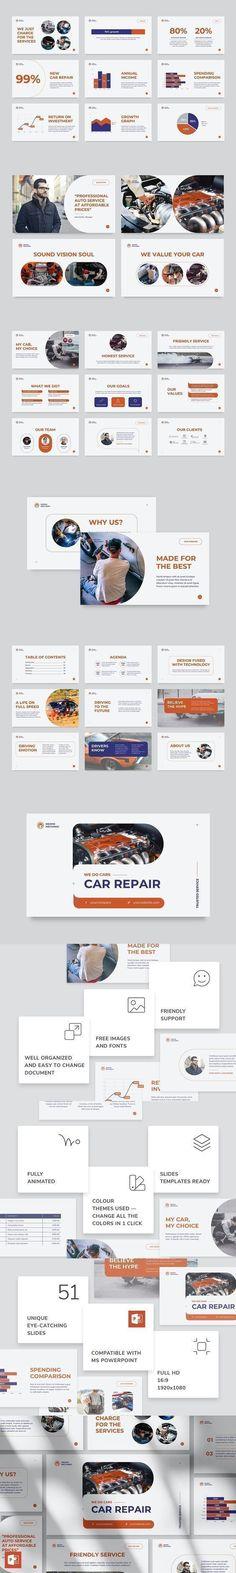 Car Repair PowerPoint Presentation